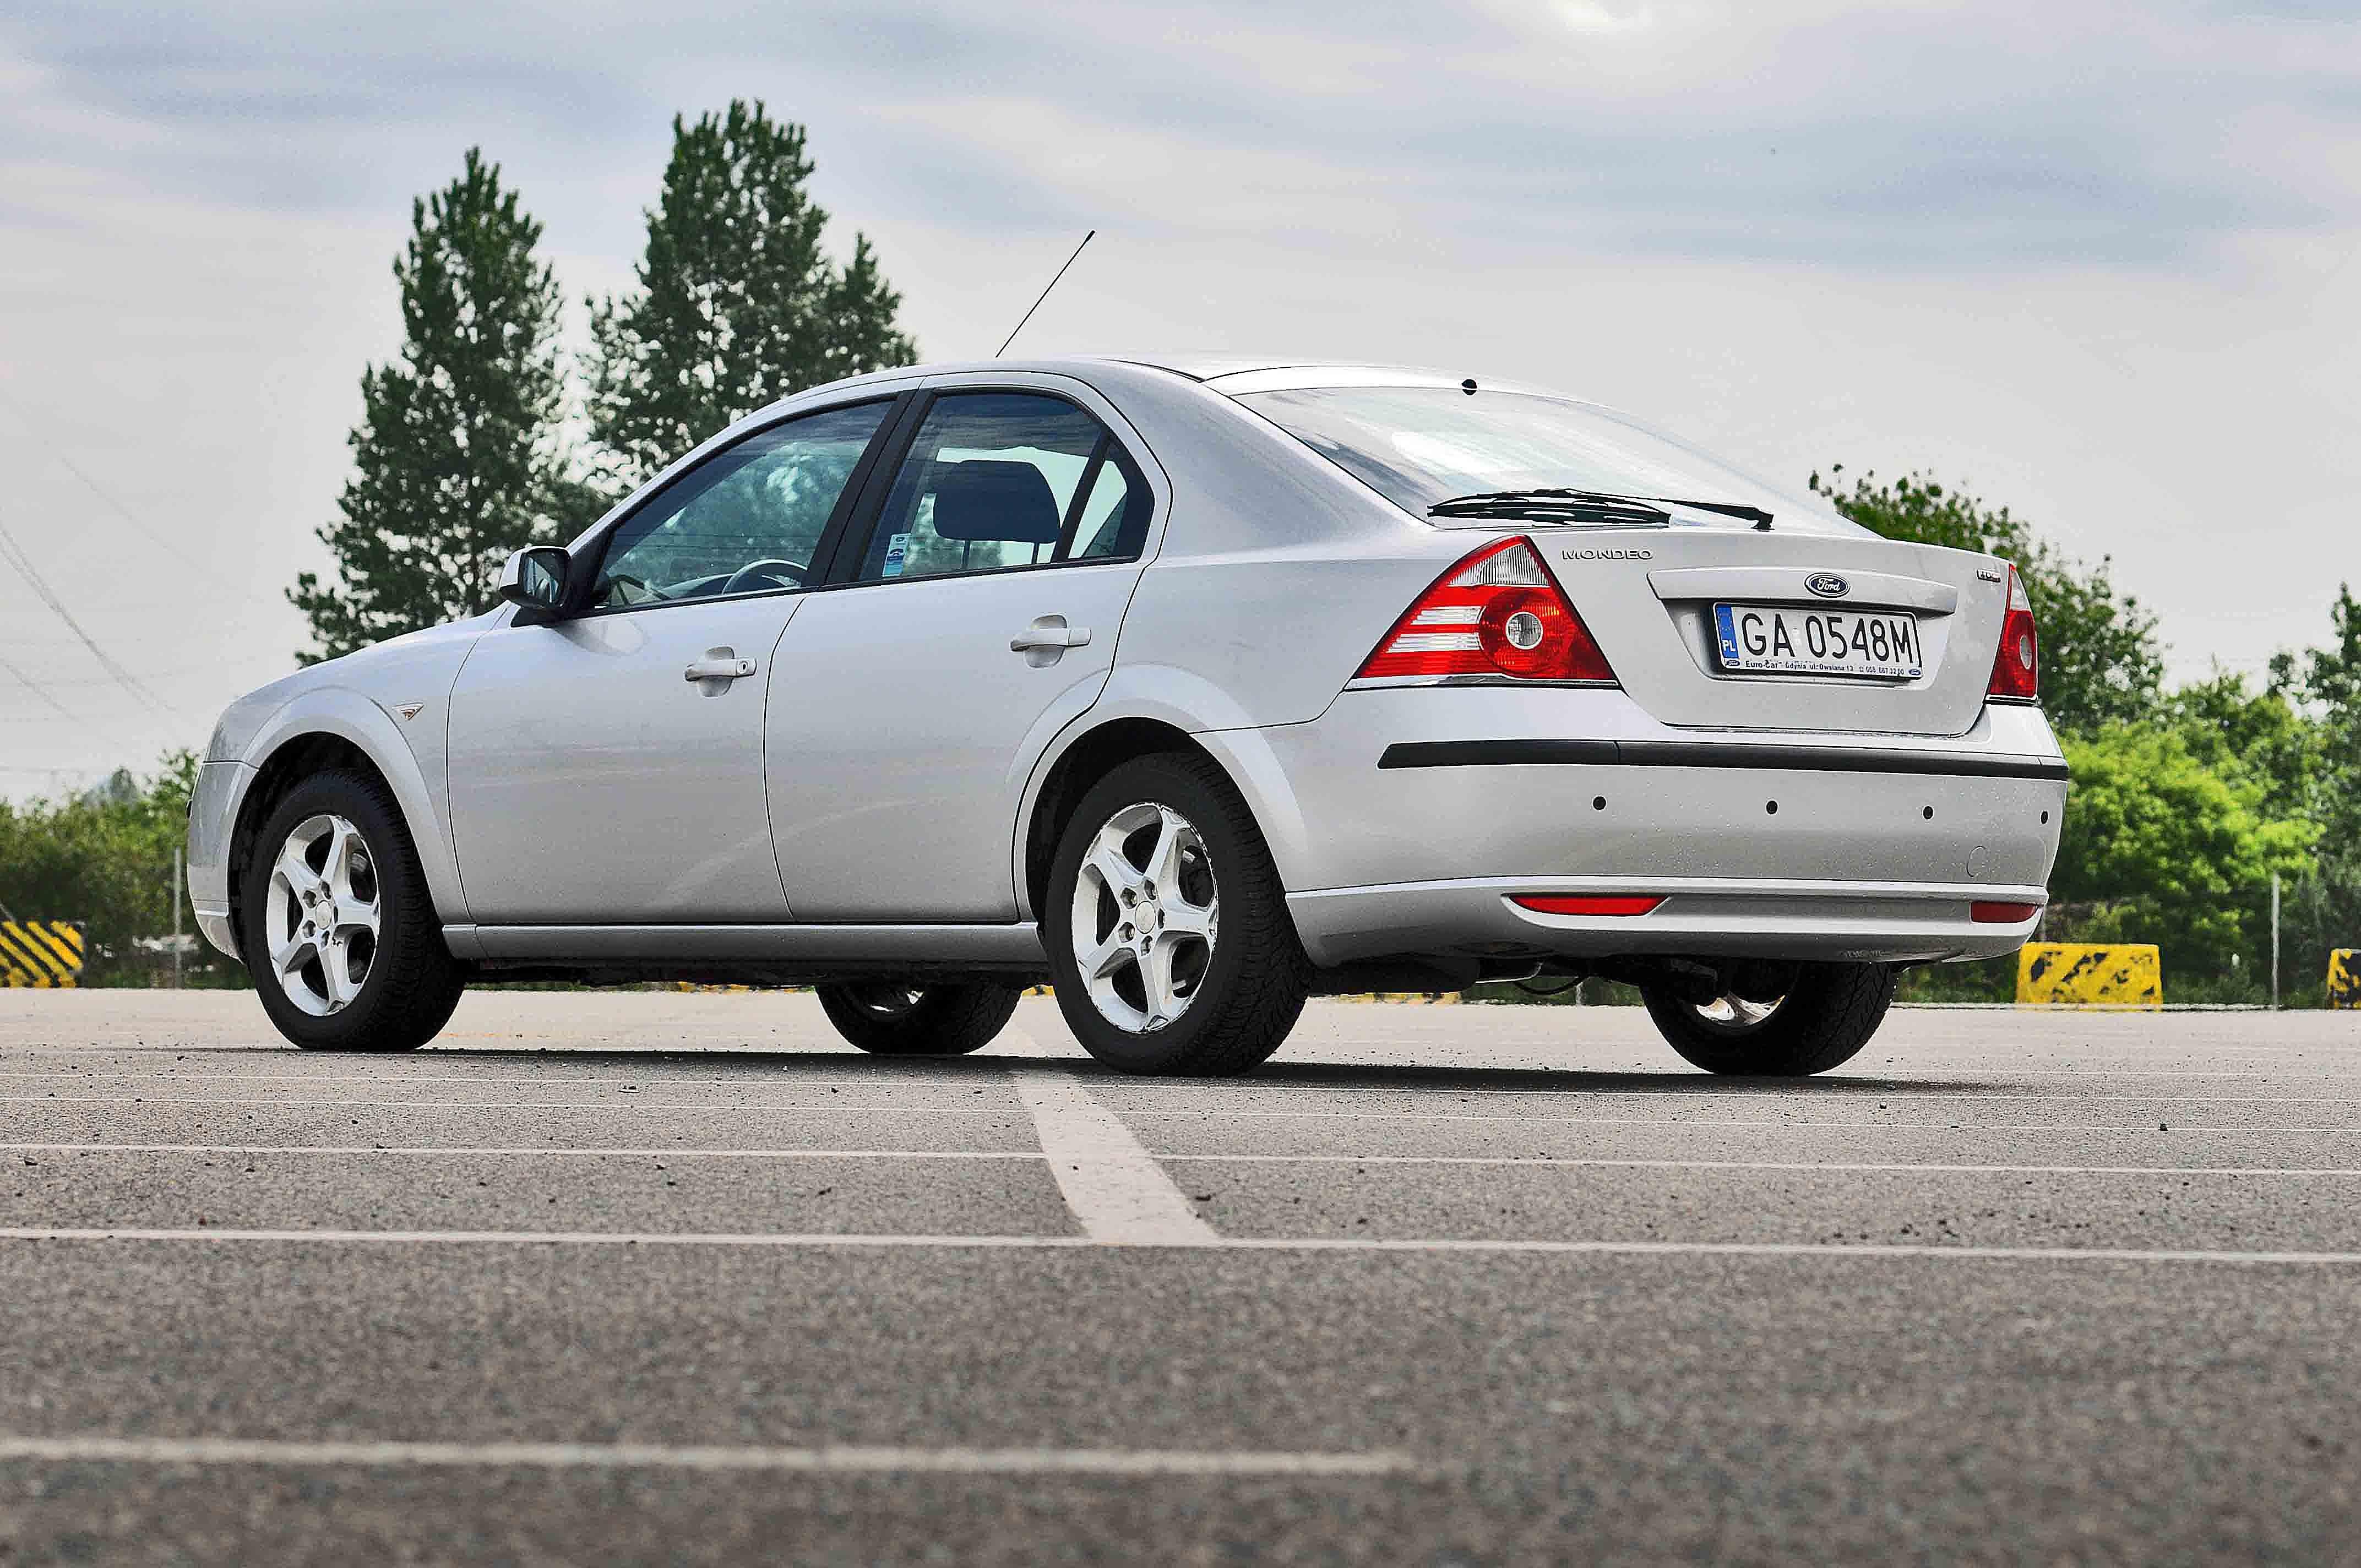 Free Images : light, wheel, parking, asphalt, square, auto, moto, silver, bed, wheels, sedan, diesel, mondeo, used, reflector, offer, alu, the vehicle, ...